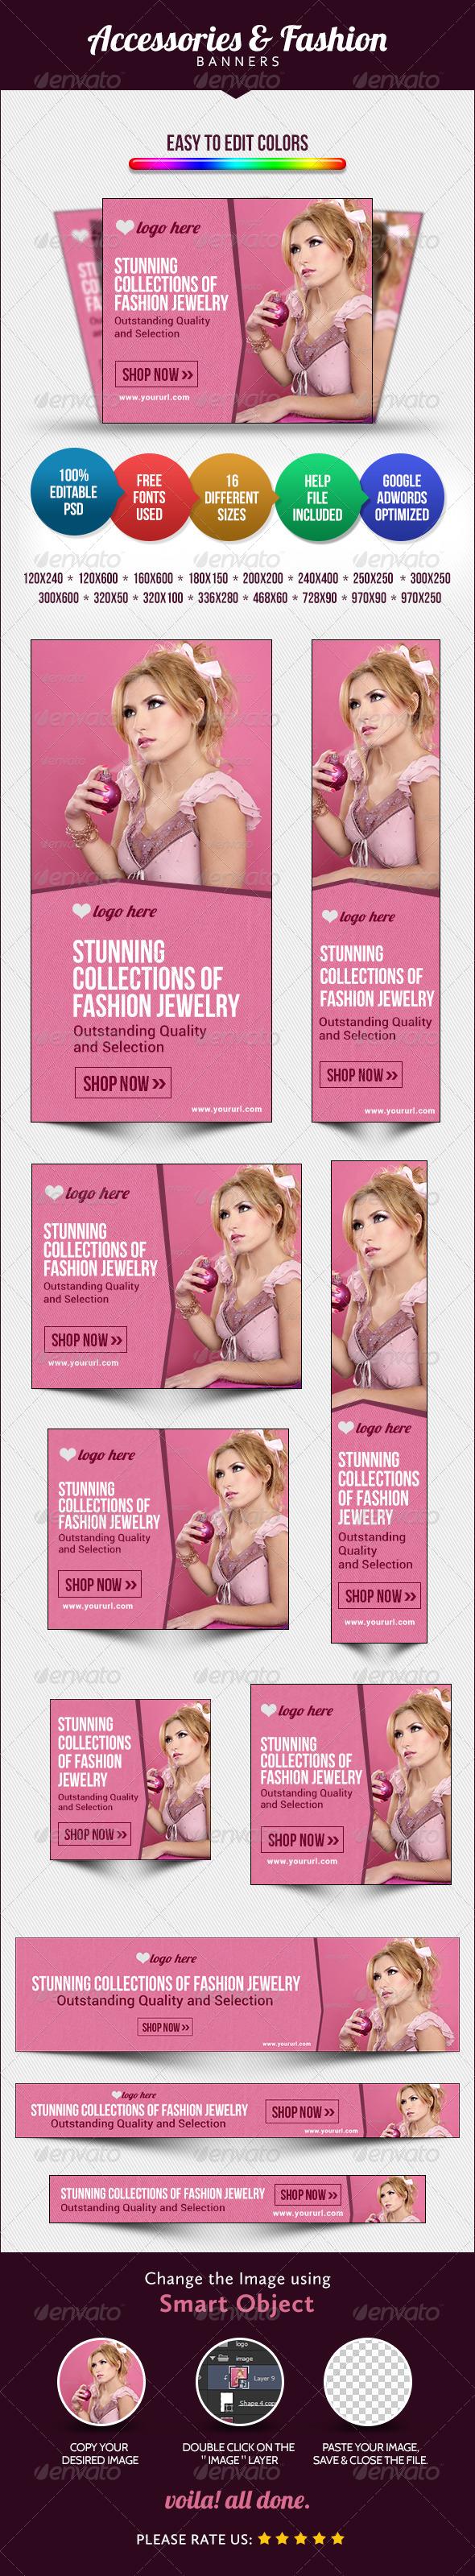 GraphicRiver Fashion Accessories Banners 8644862